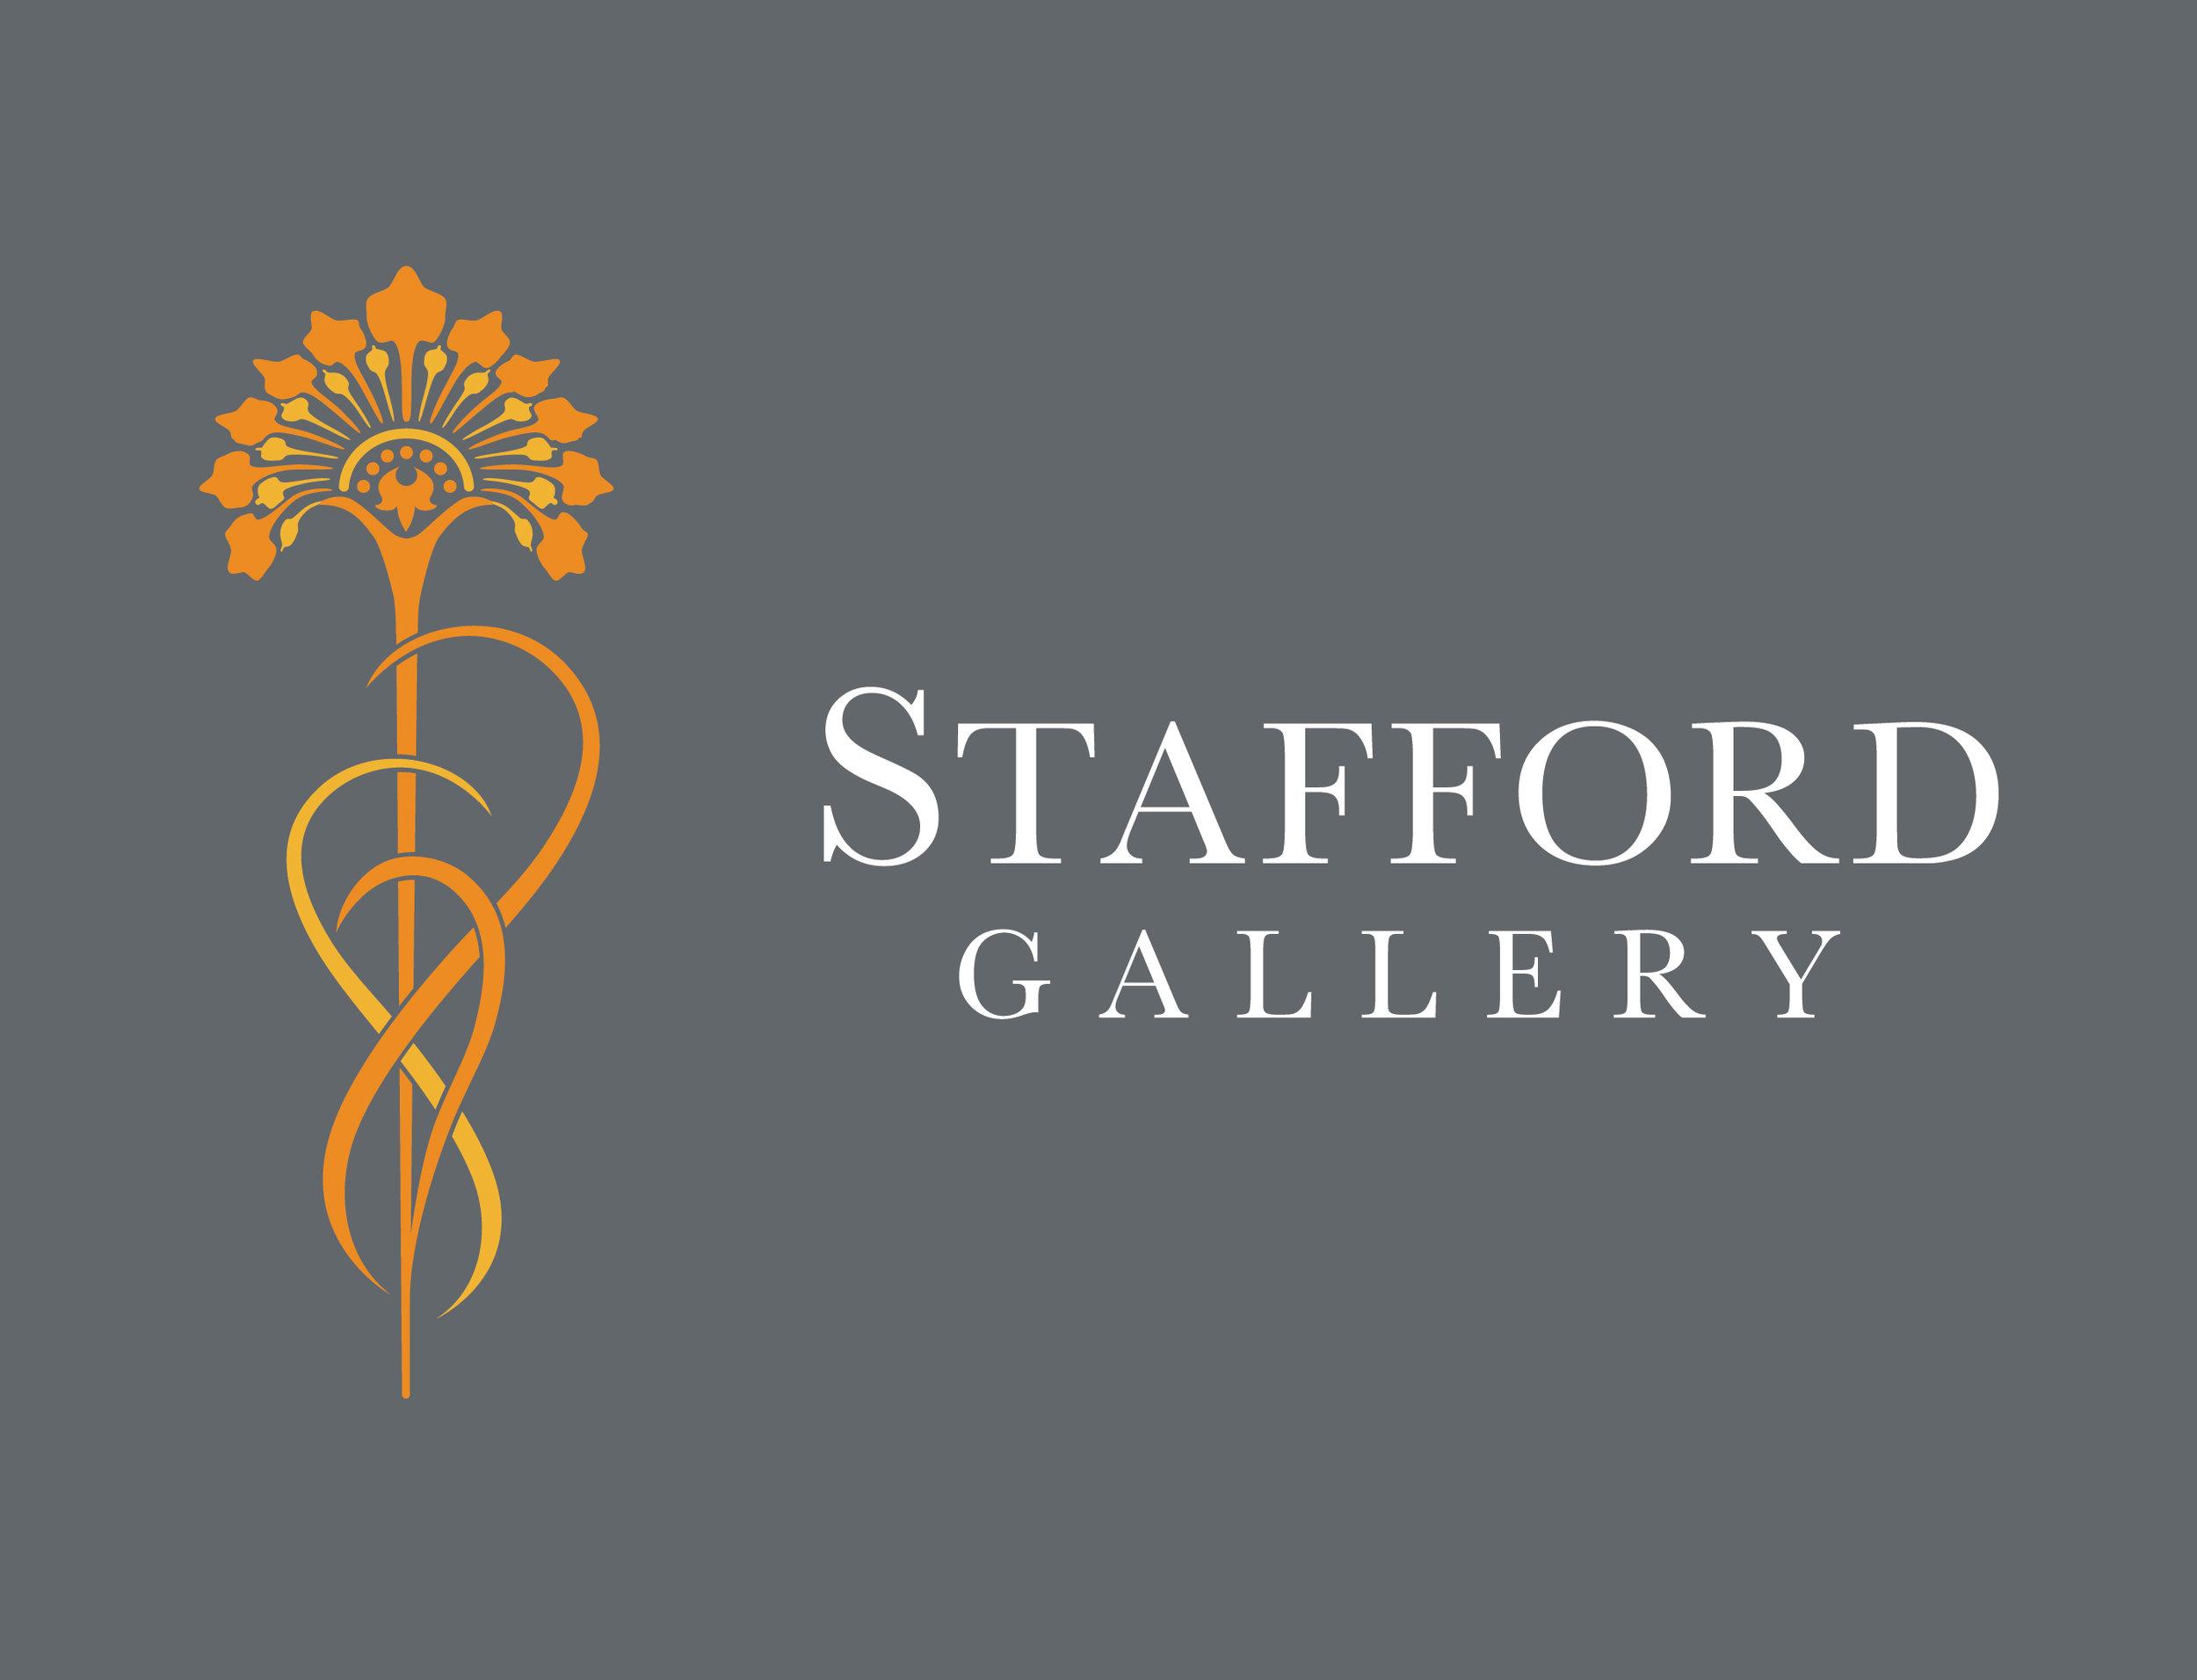 StaffordGalleryLogoFinal_Grey_Orange.jpg